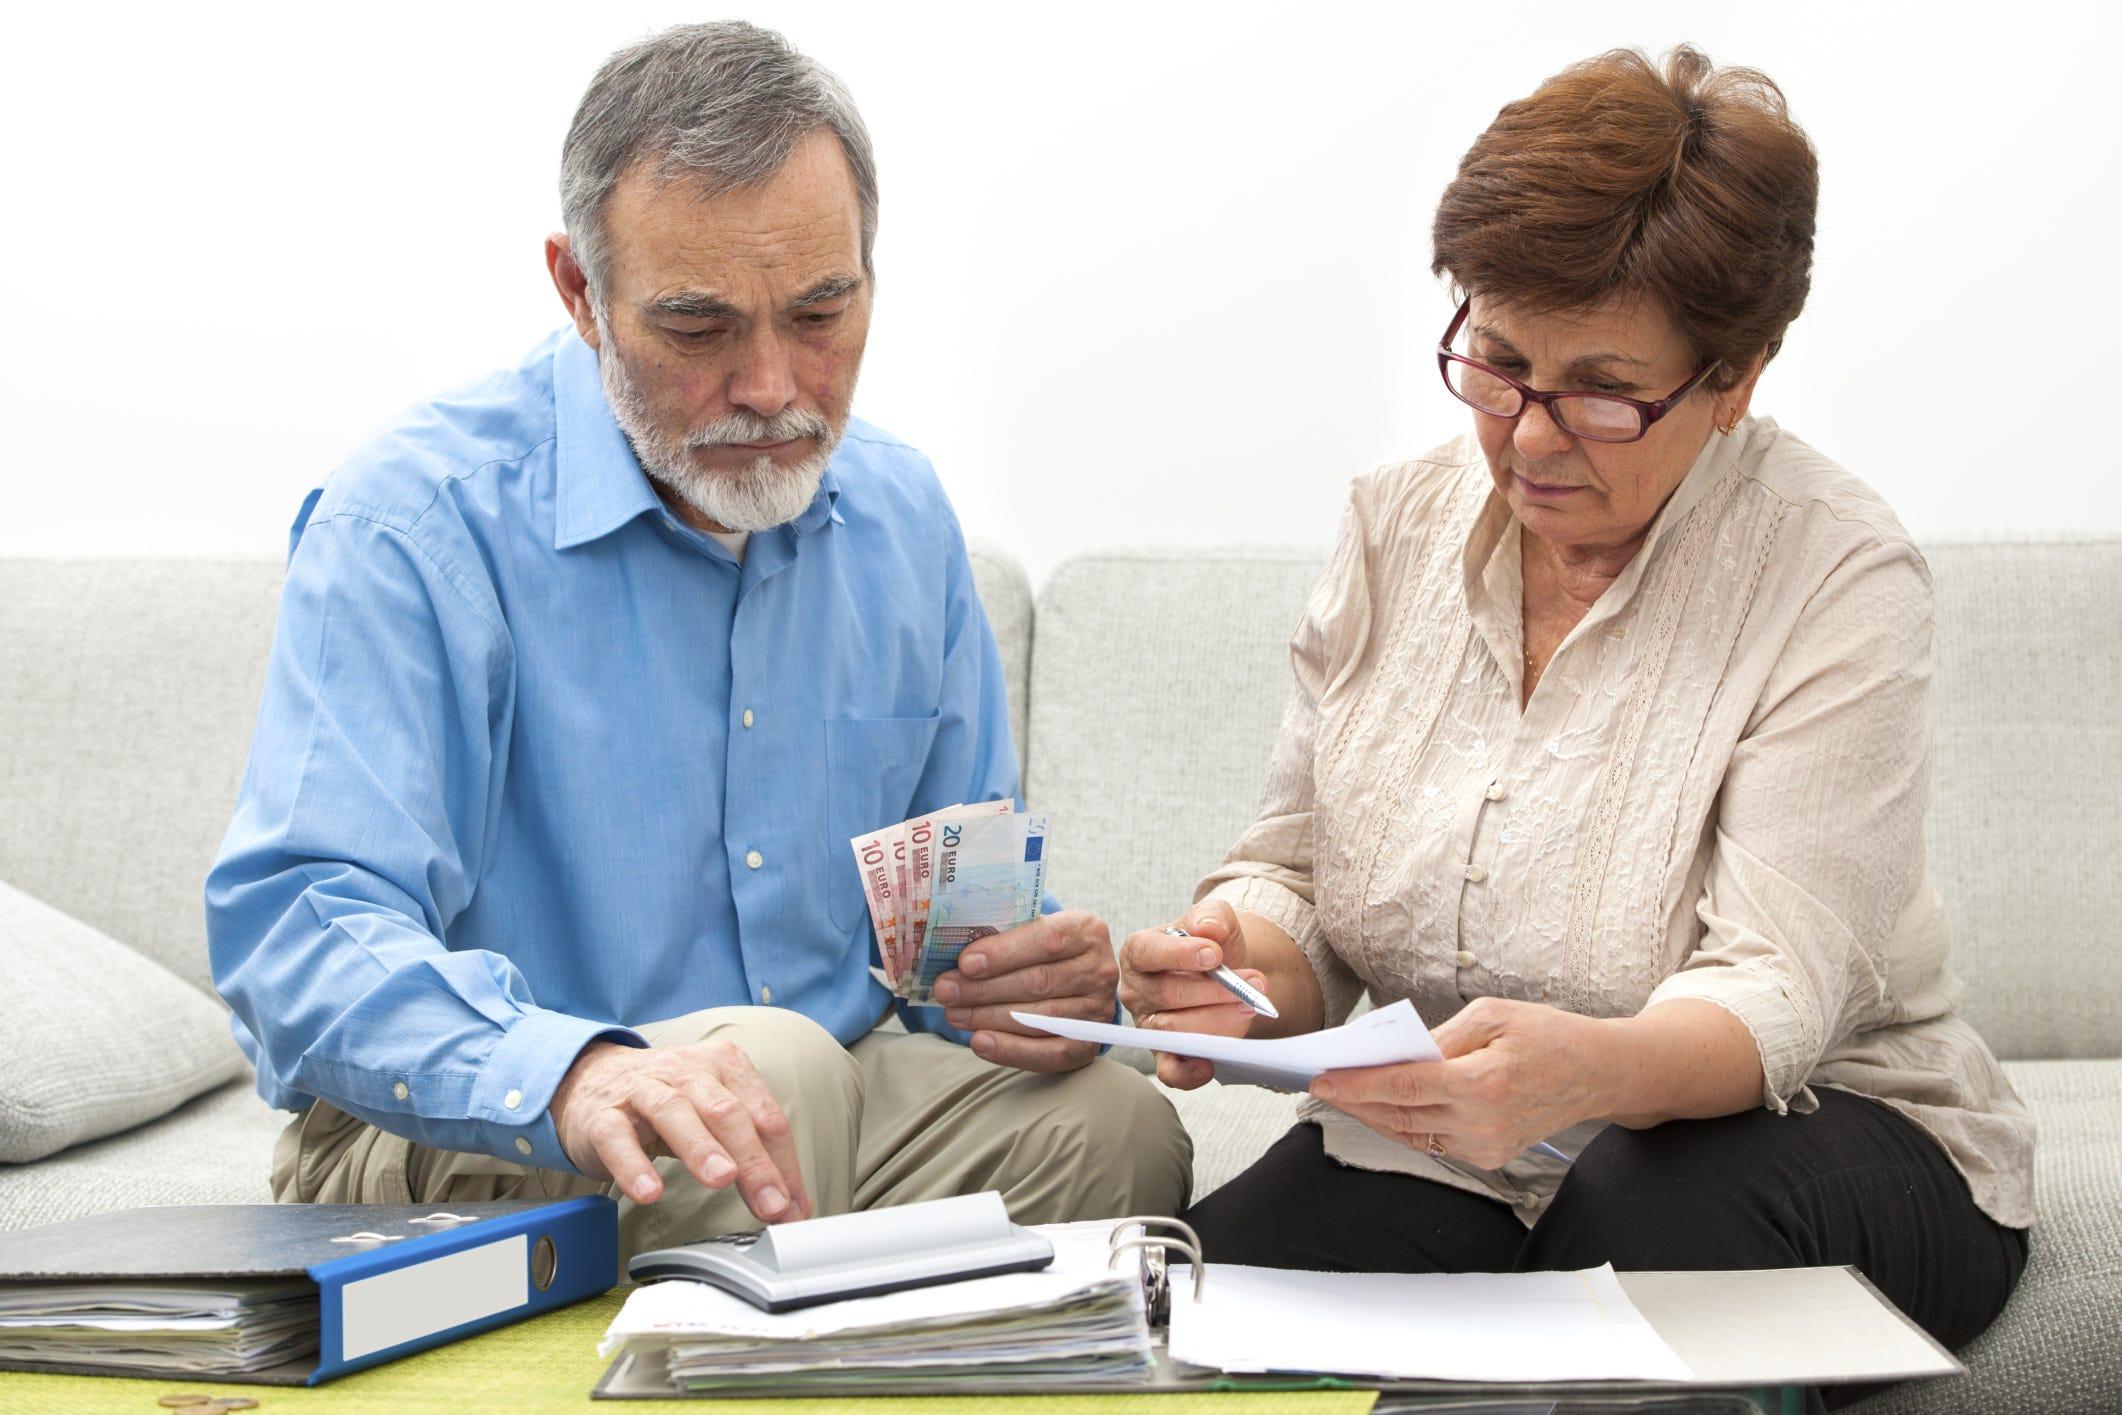 Major money mistakes for seniors and retirees